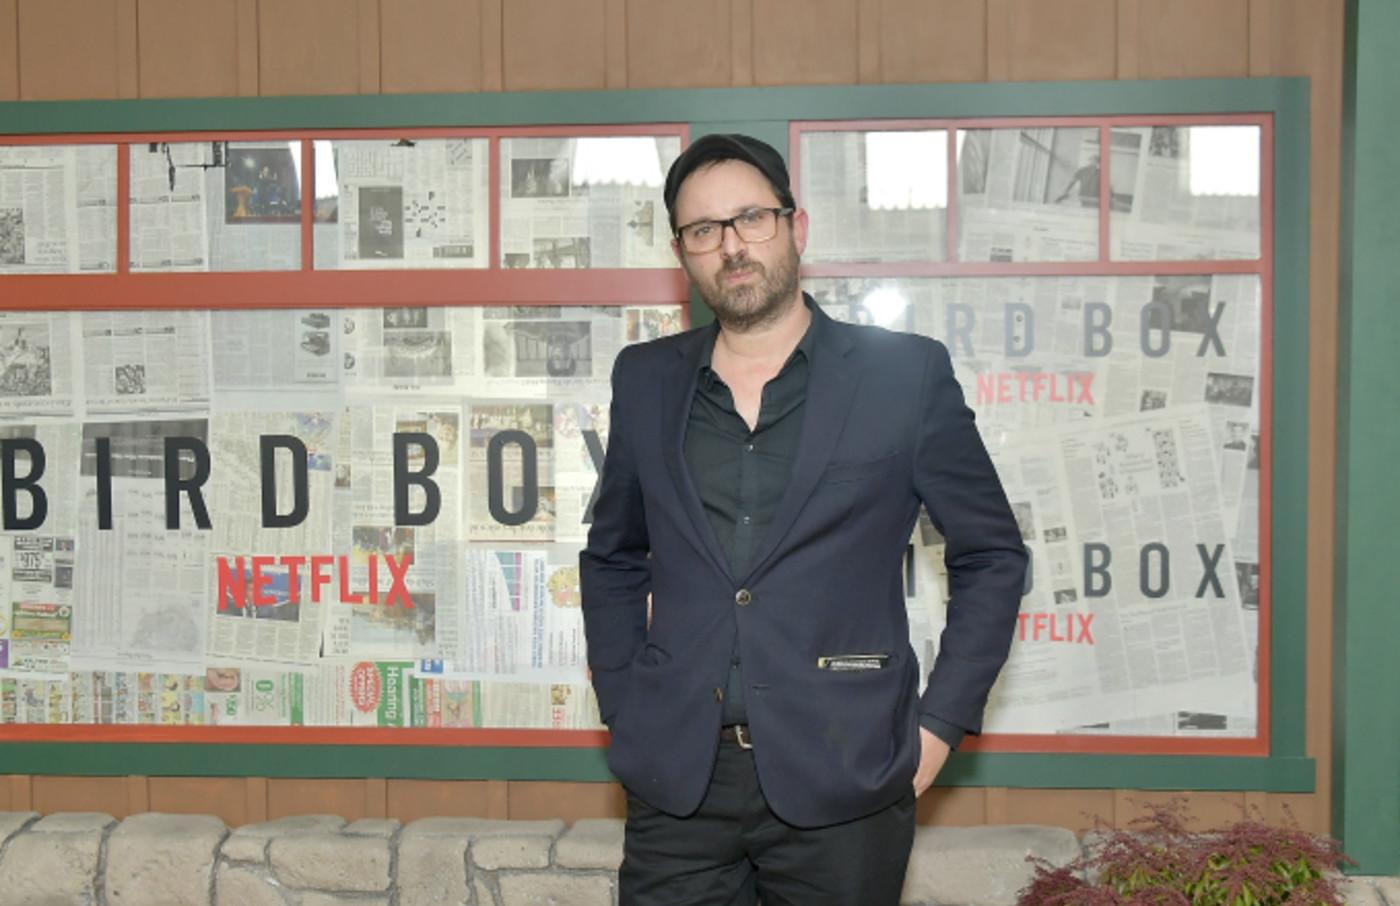 Author of the novel, Josh Malerman attends the New York screening of 'Bird Box'